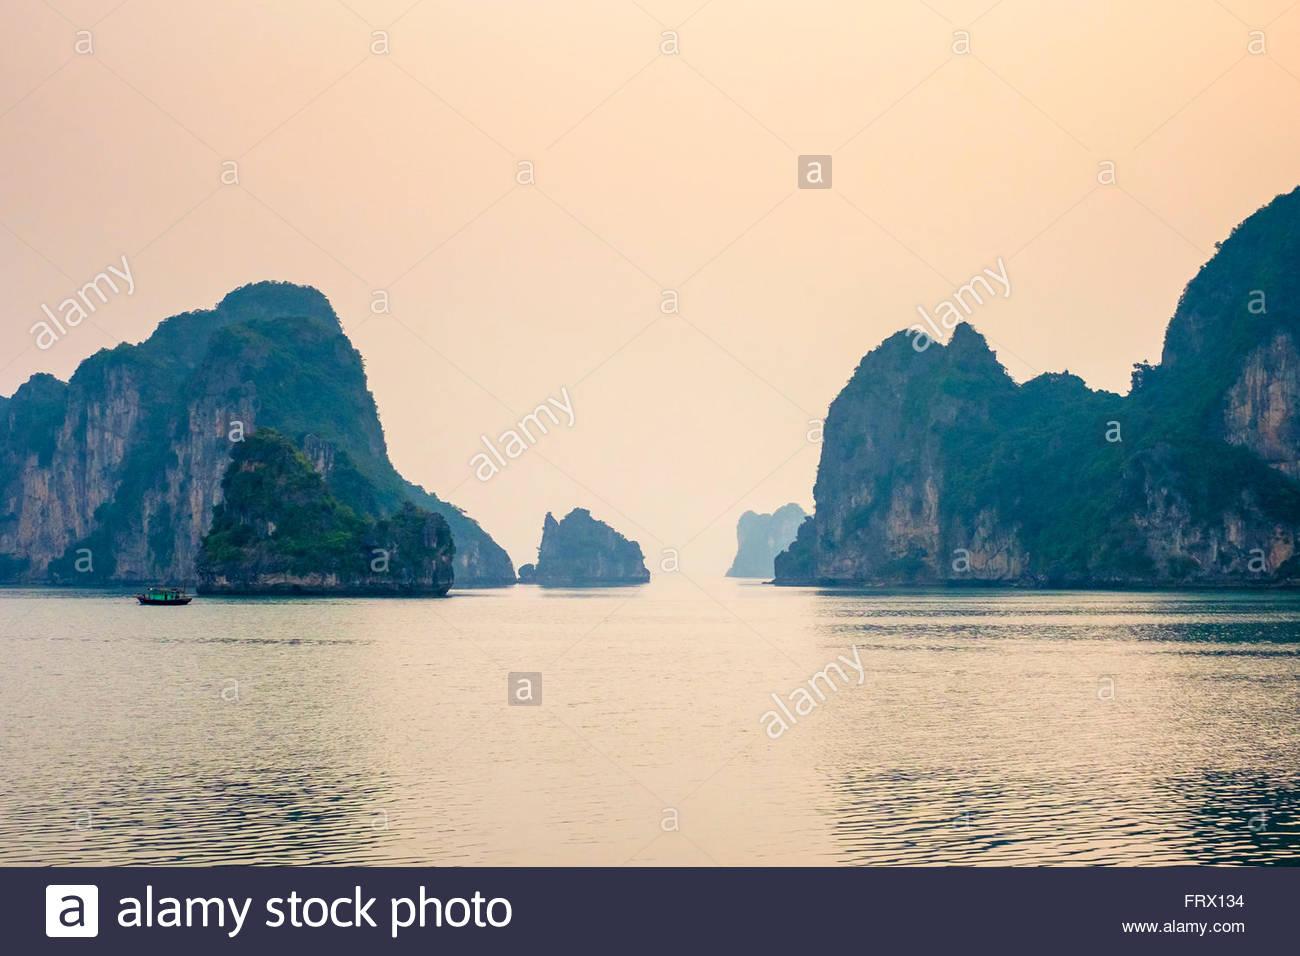 Karst mountain landscape in Ha Long Bay after sunset, Quảng Ninh Province, Vietnam Stock Photo